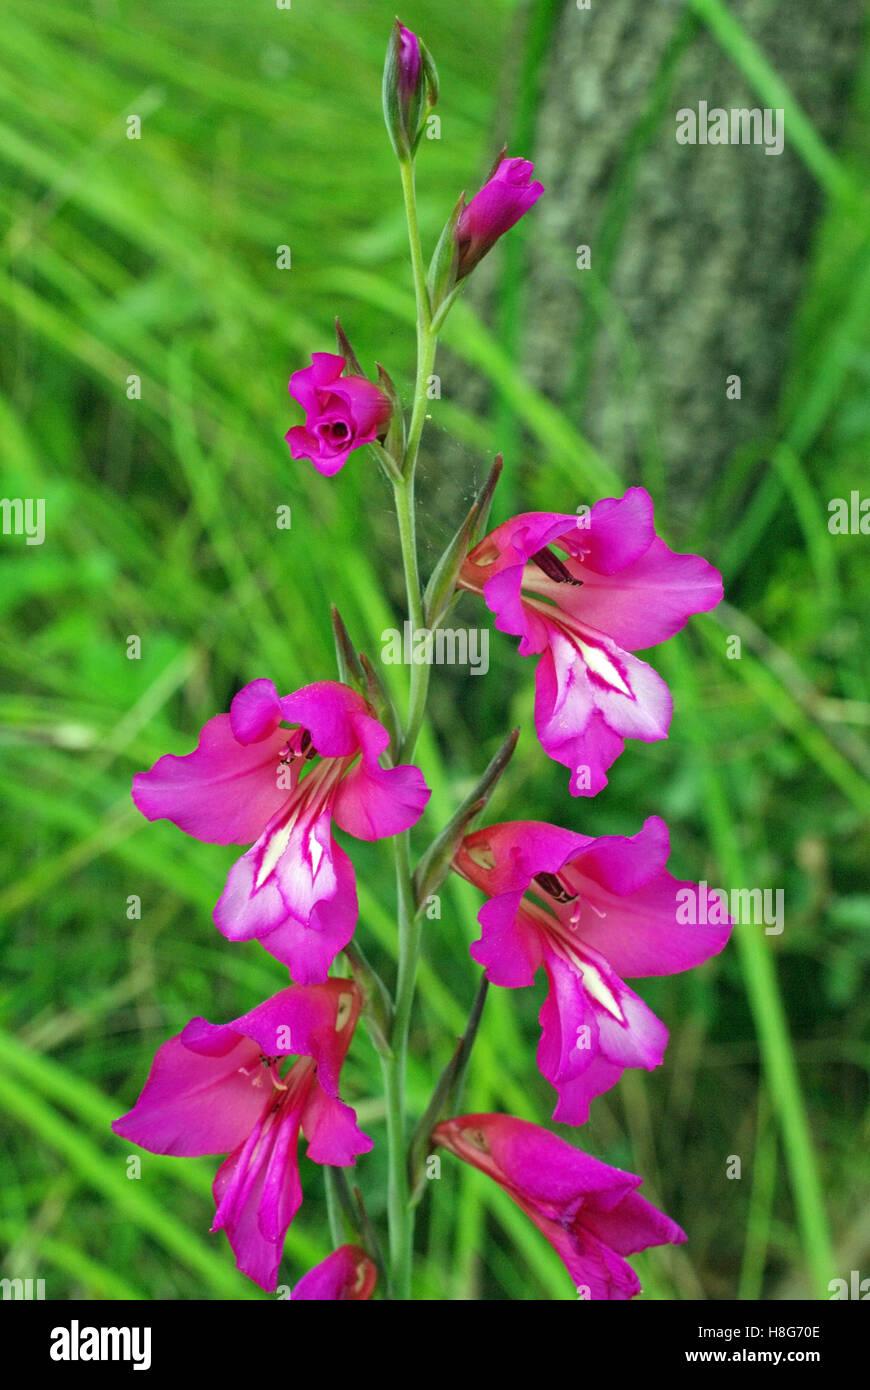 The wildflower Gladiolus italicus, the Italian gladiolus, a member of the Iris family (Iridaceae) - Stock Image